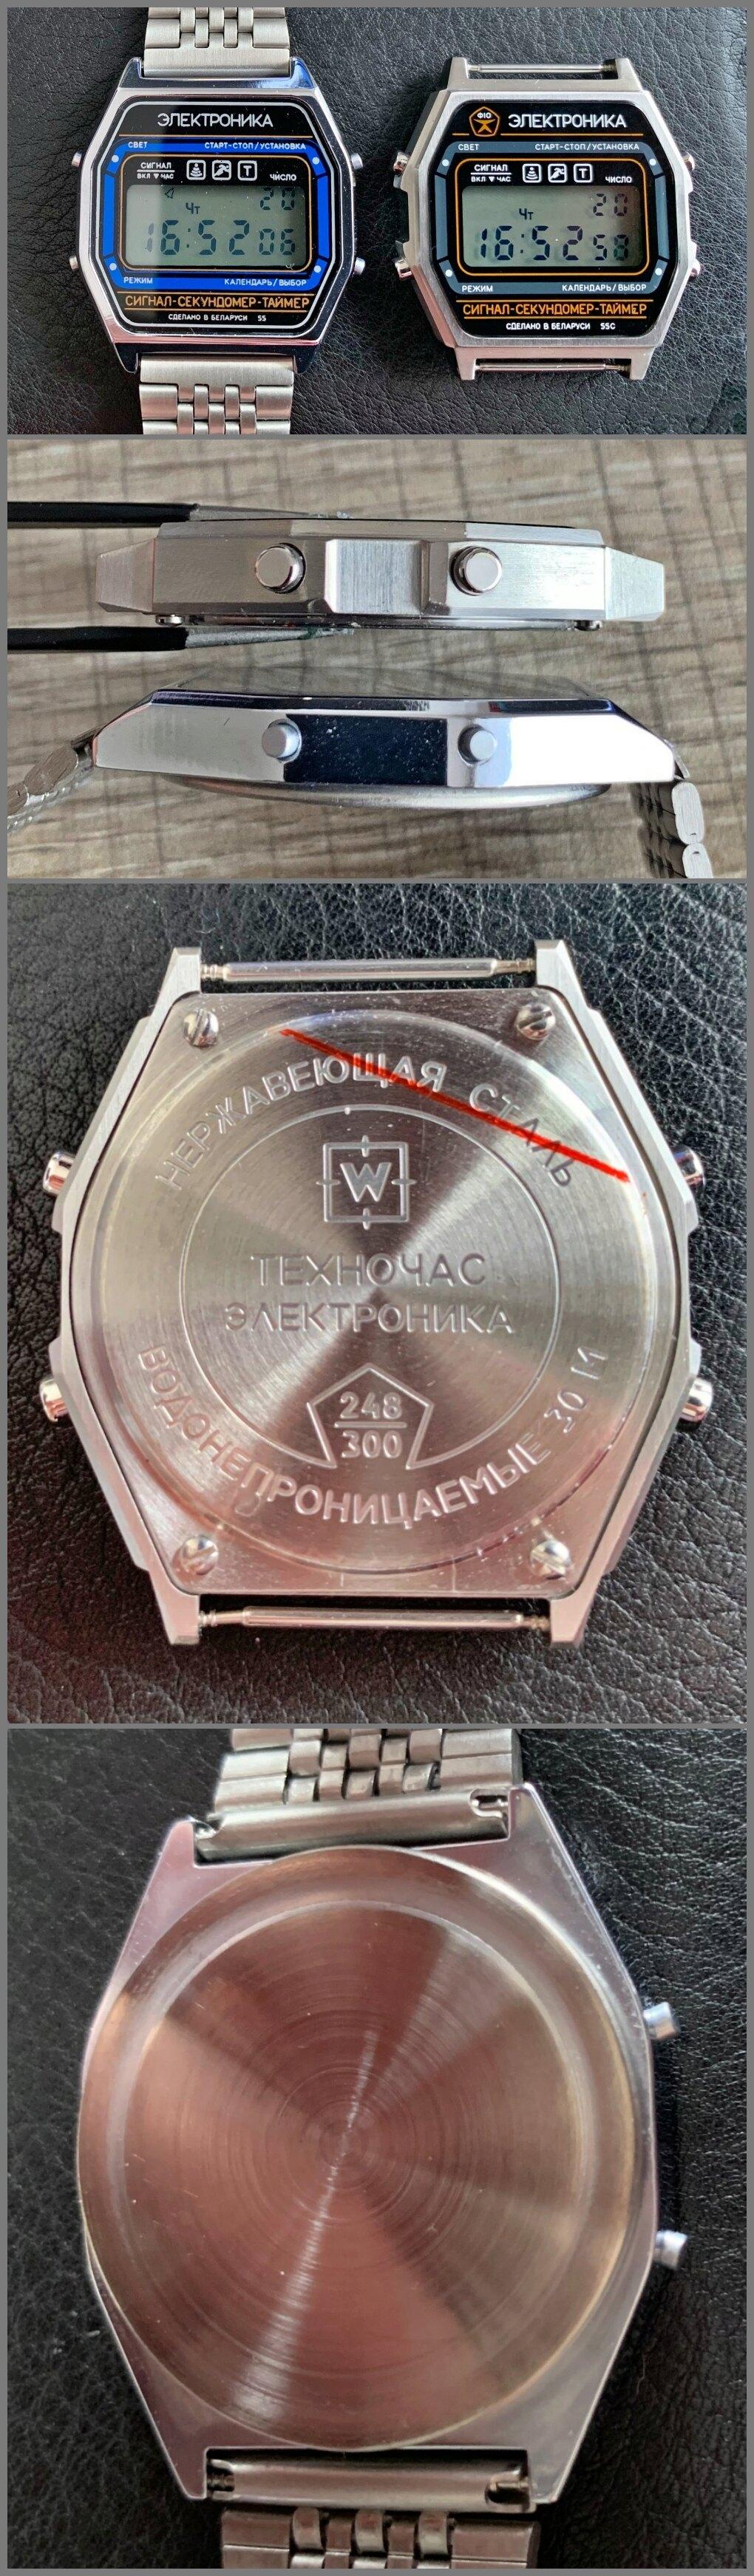 Mini revue : Technolas ELEKTRONIKA 55 C édition spéciale WUS  Img_3515